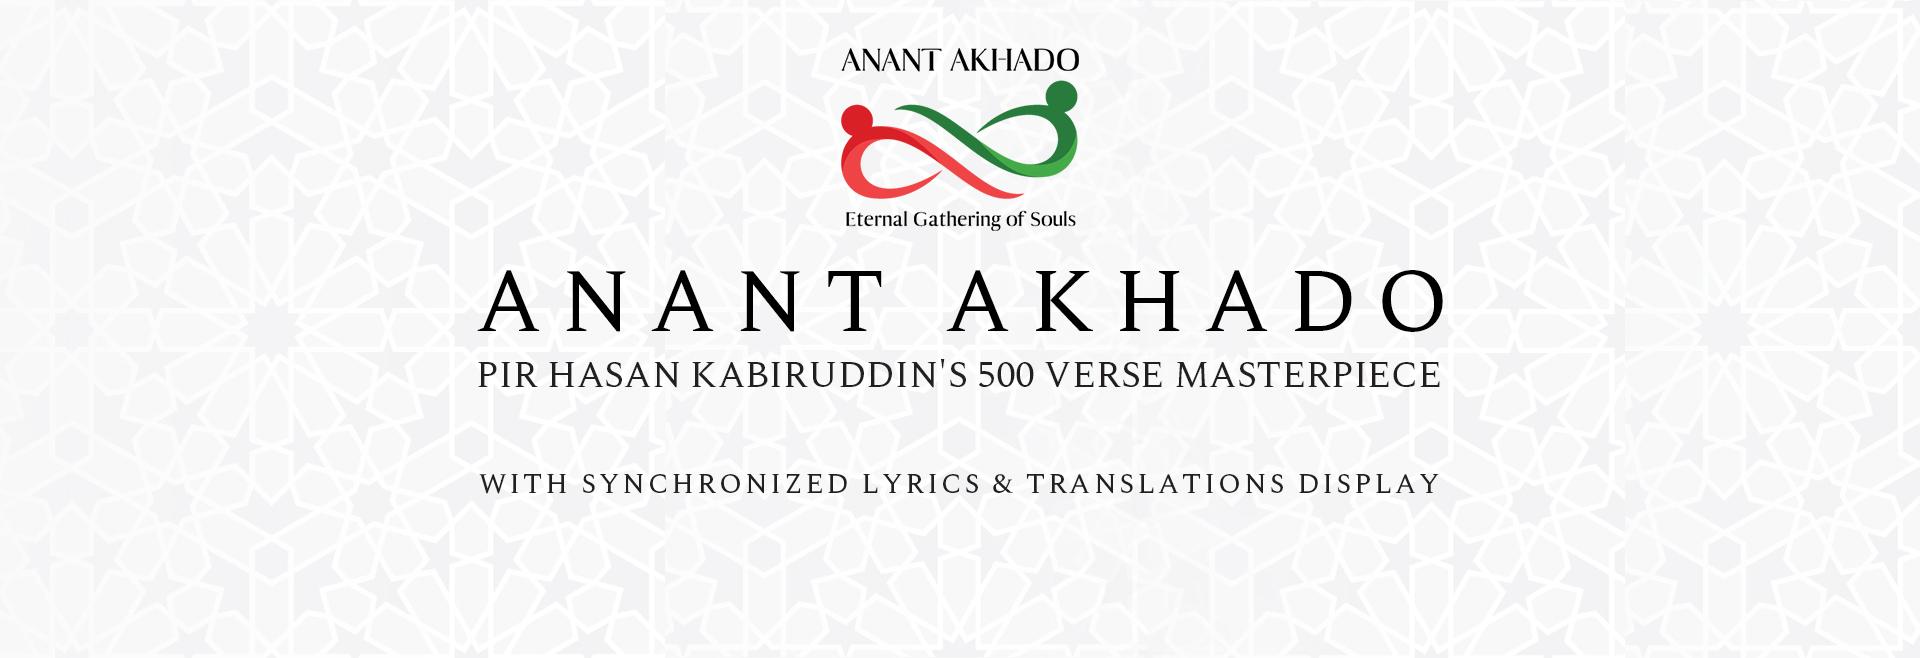 Anant Akhado Service